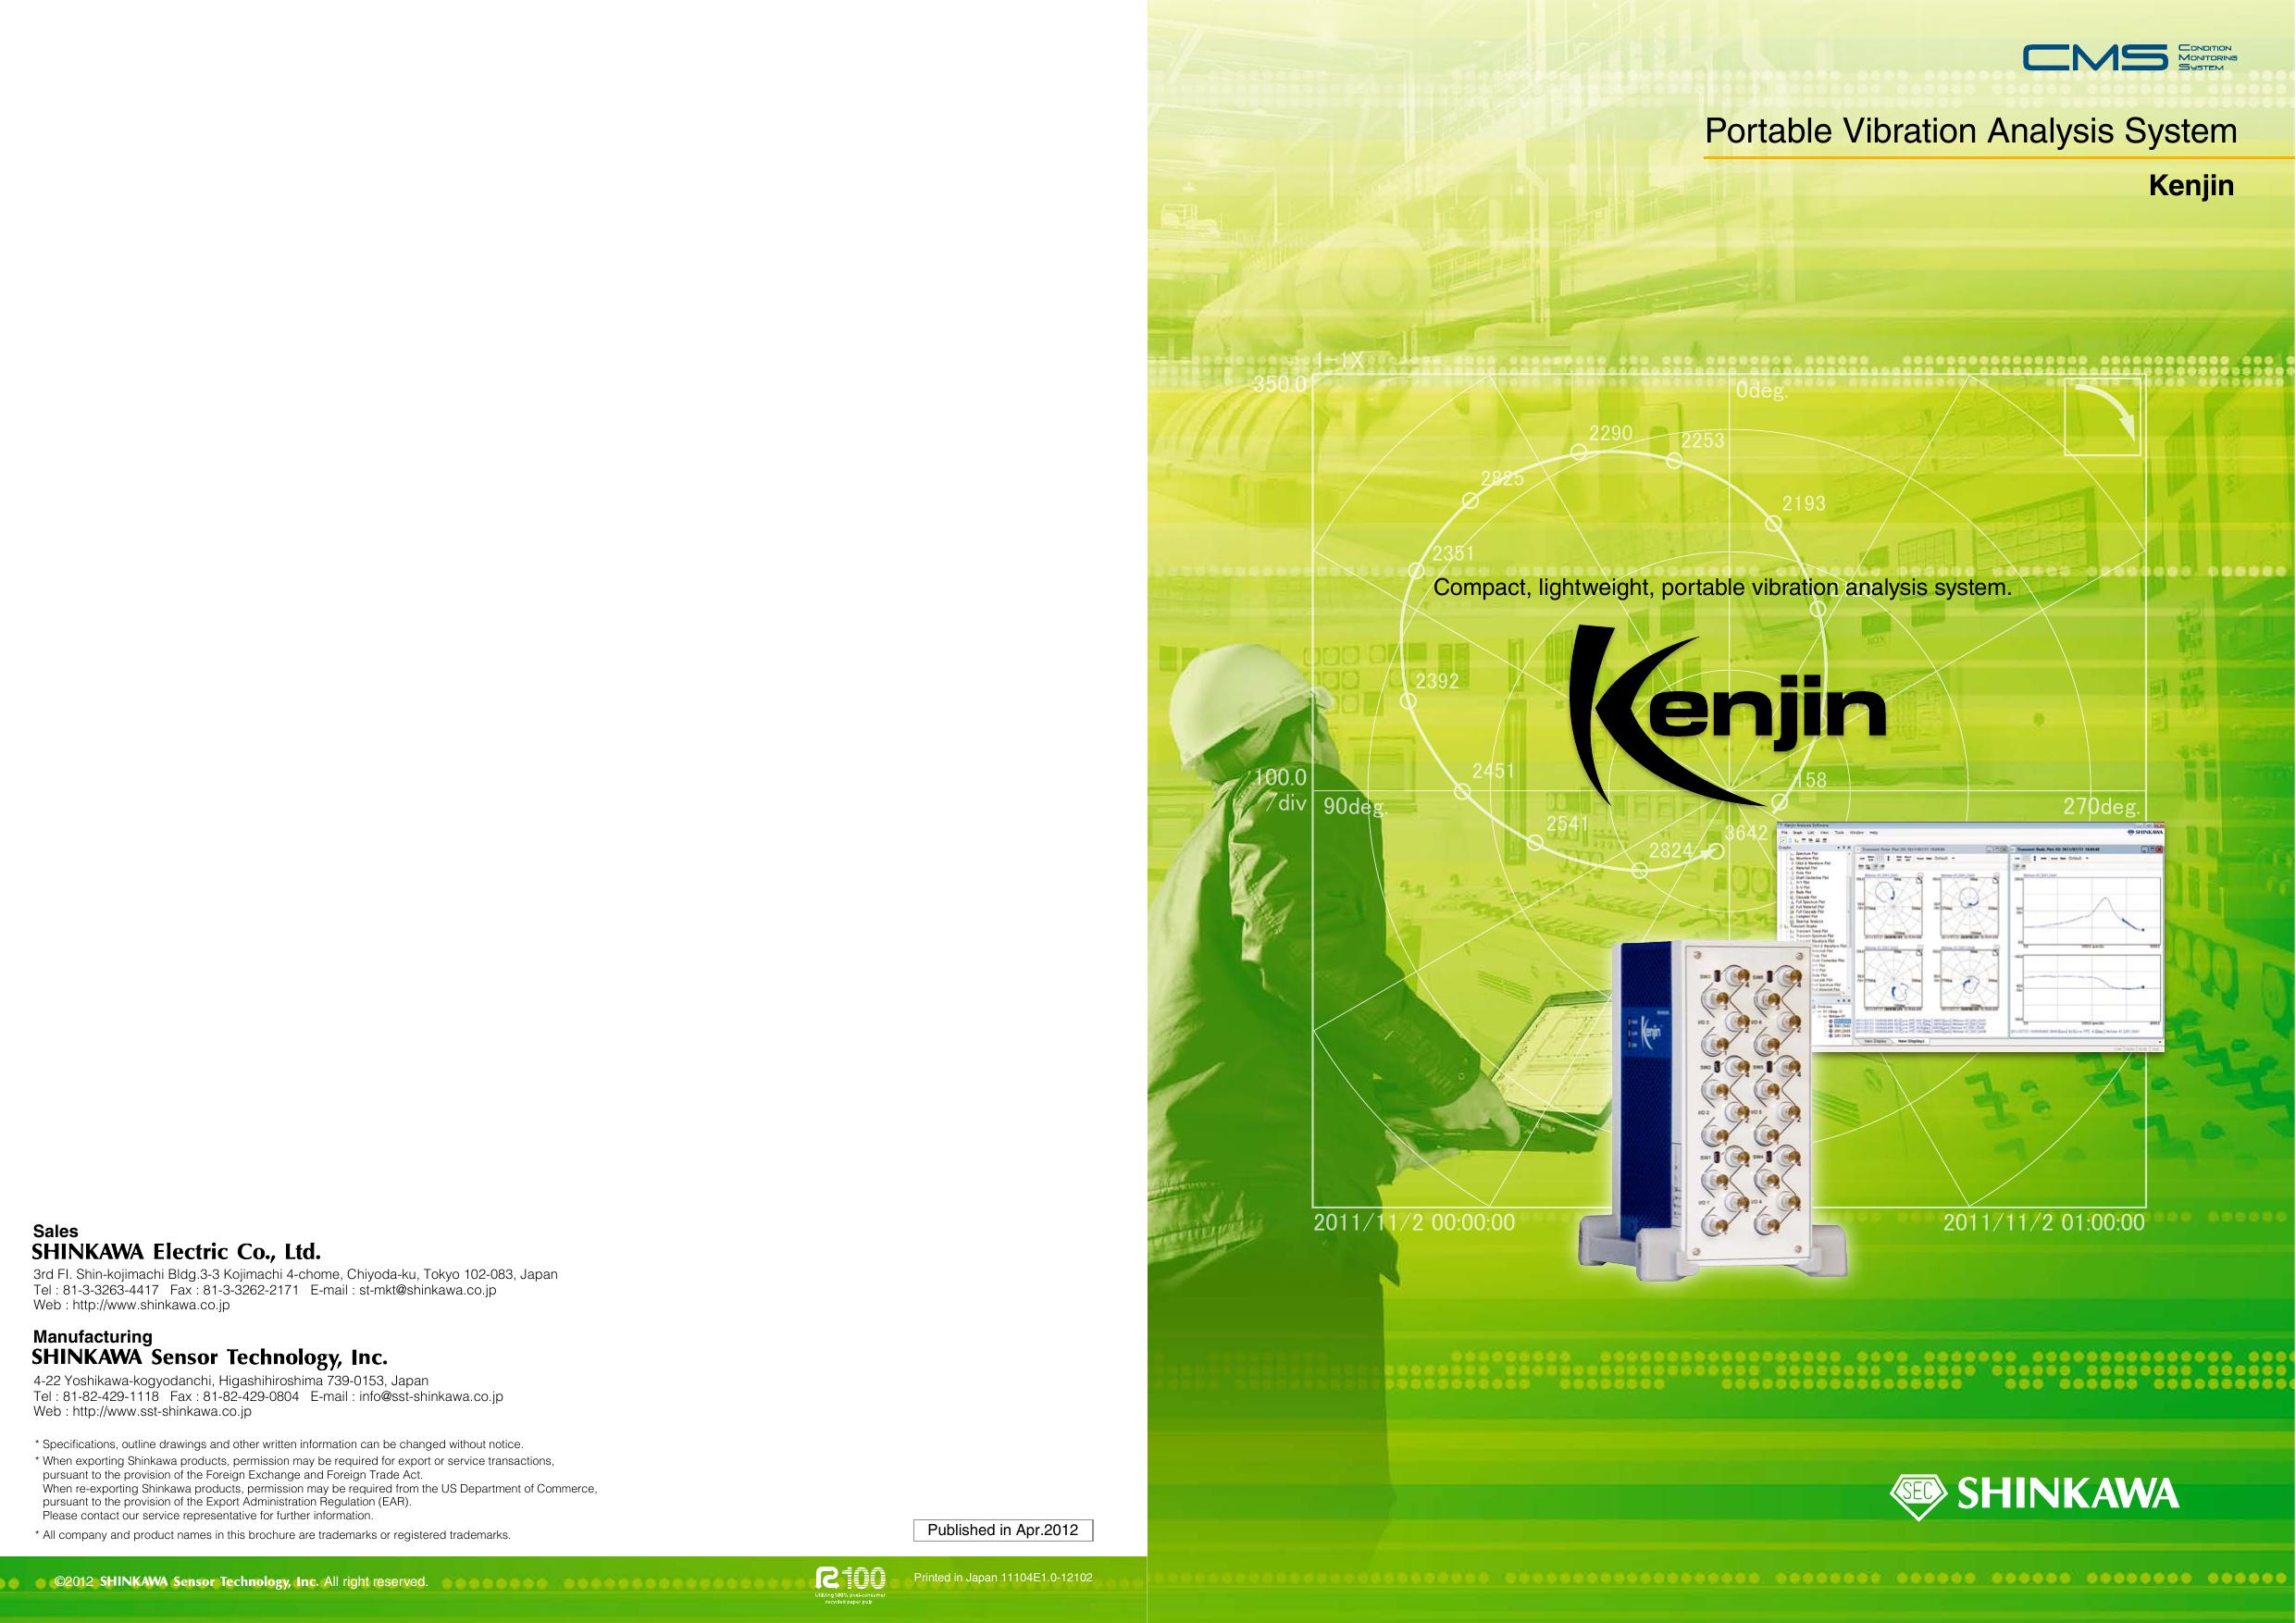 Portable Vibration Analysis System Kenjin